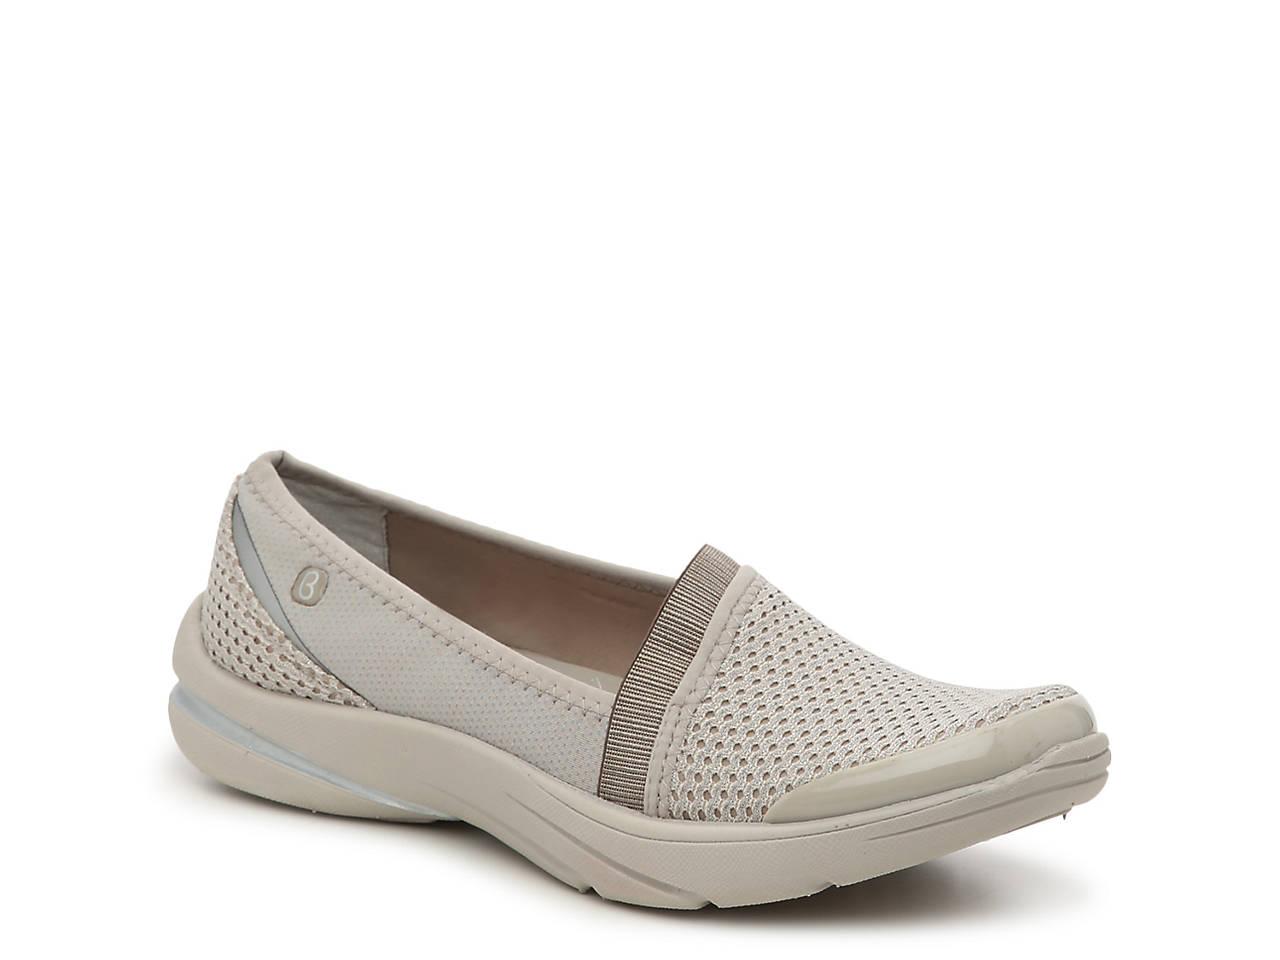 330fb19ca61b BZees Lollipop Slip-On Women s Shoes